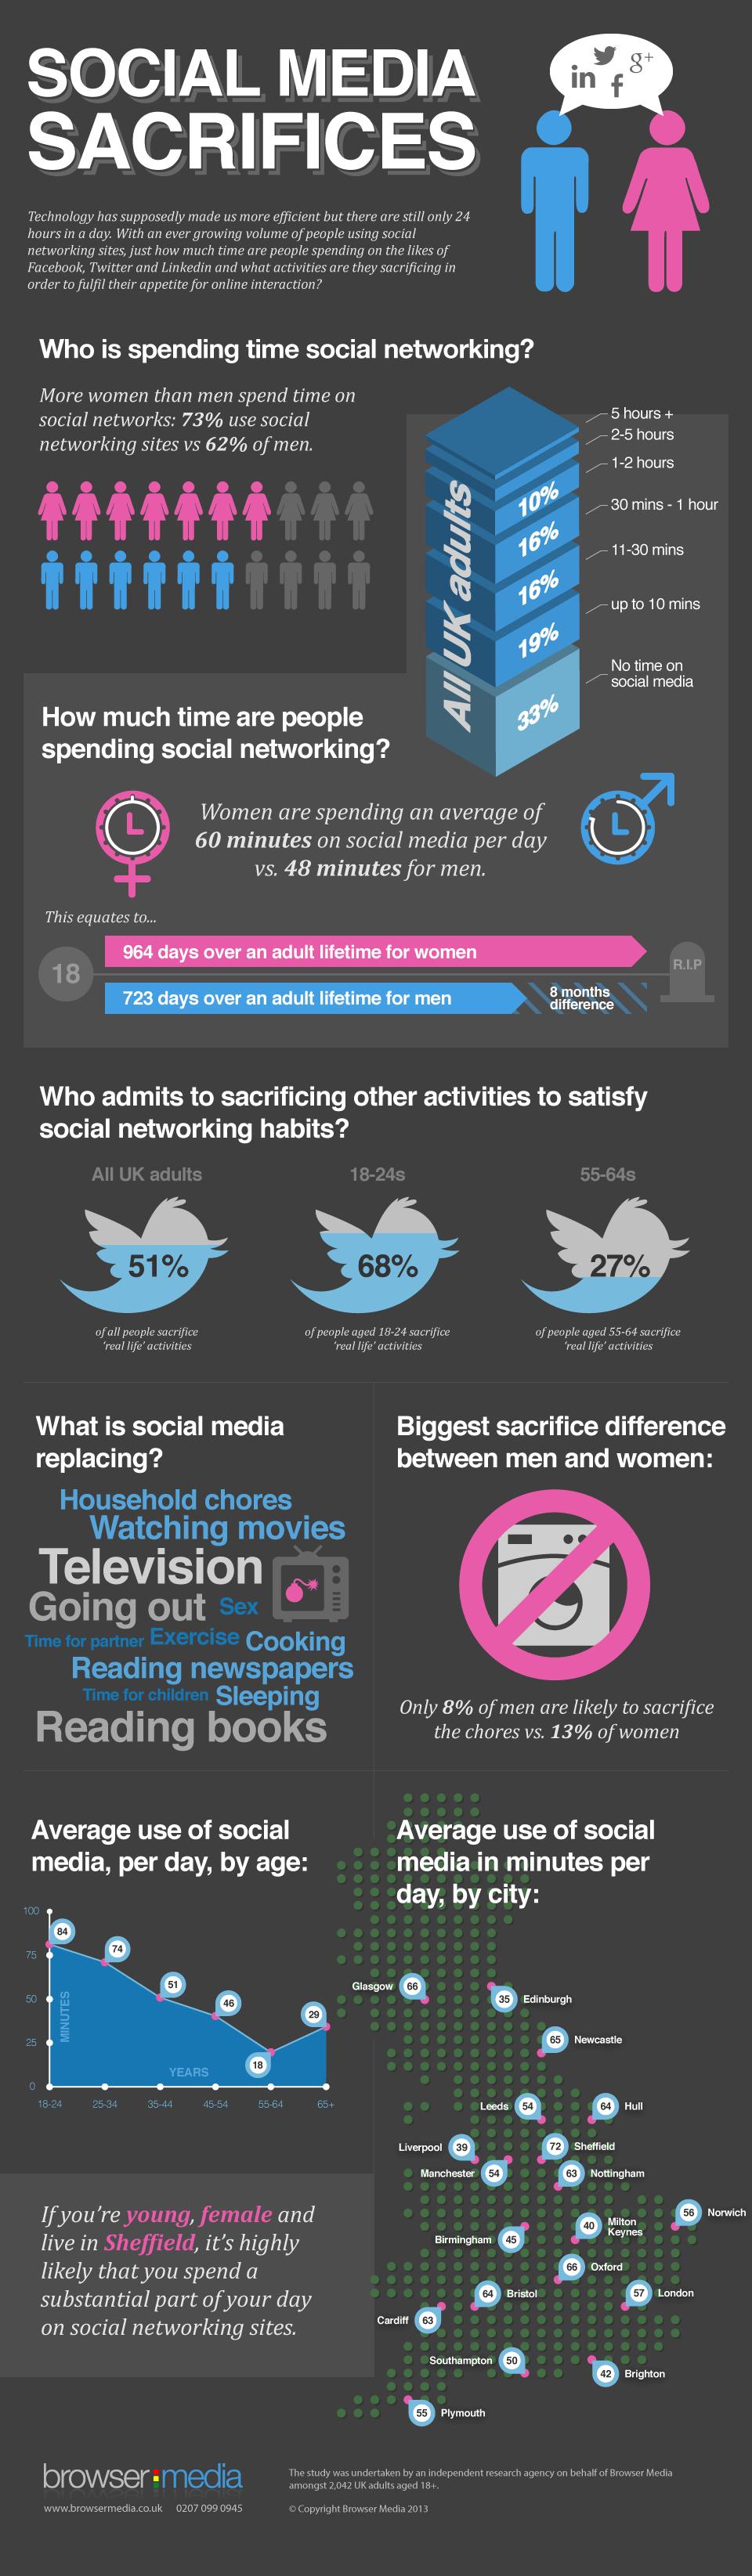 social-media-sacrifices-browser-media